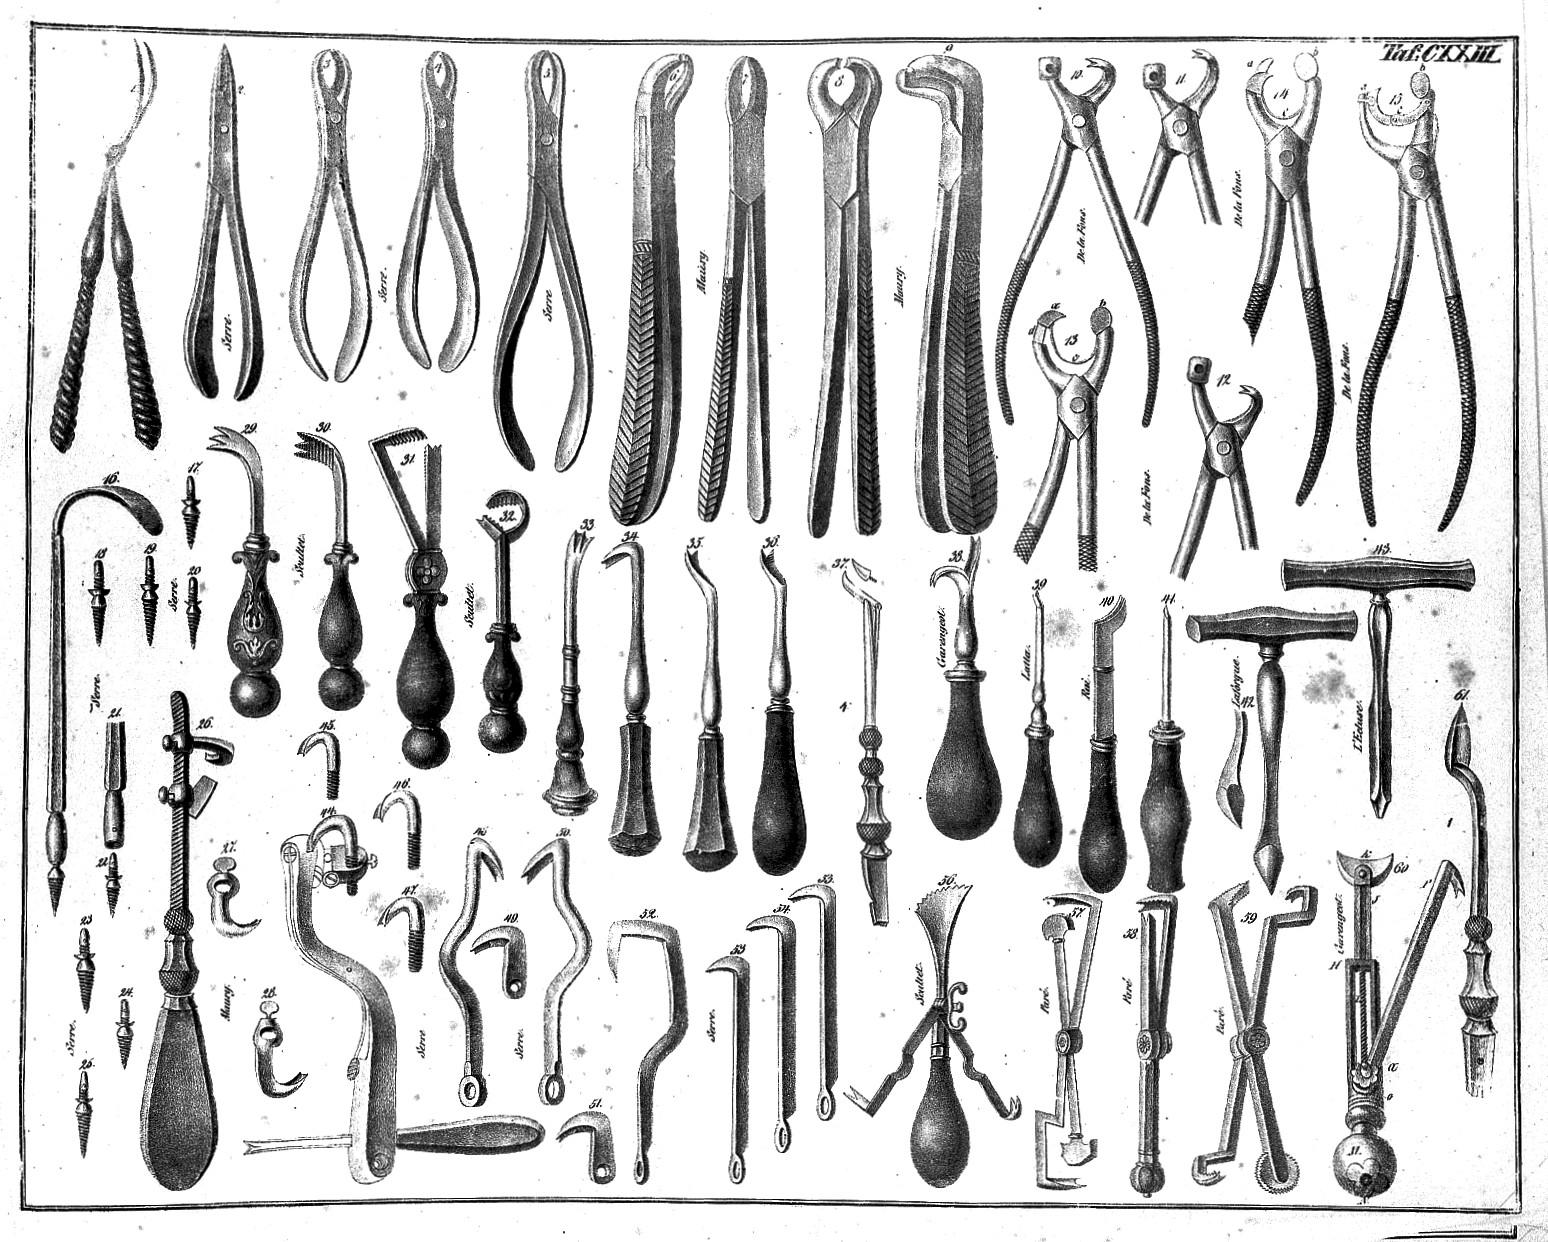 File:Dental instruments, Seerig Wellcome L0007190 jpg - Wikimedia